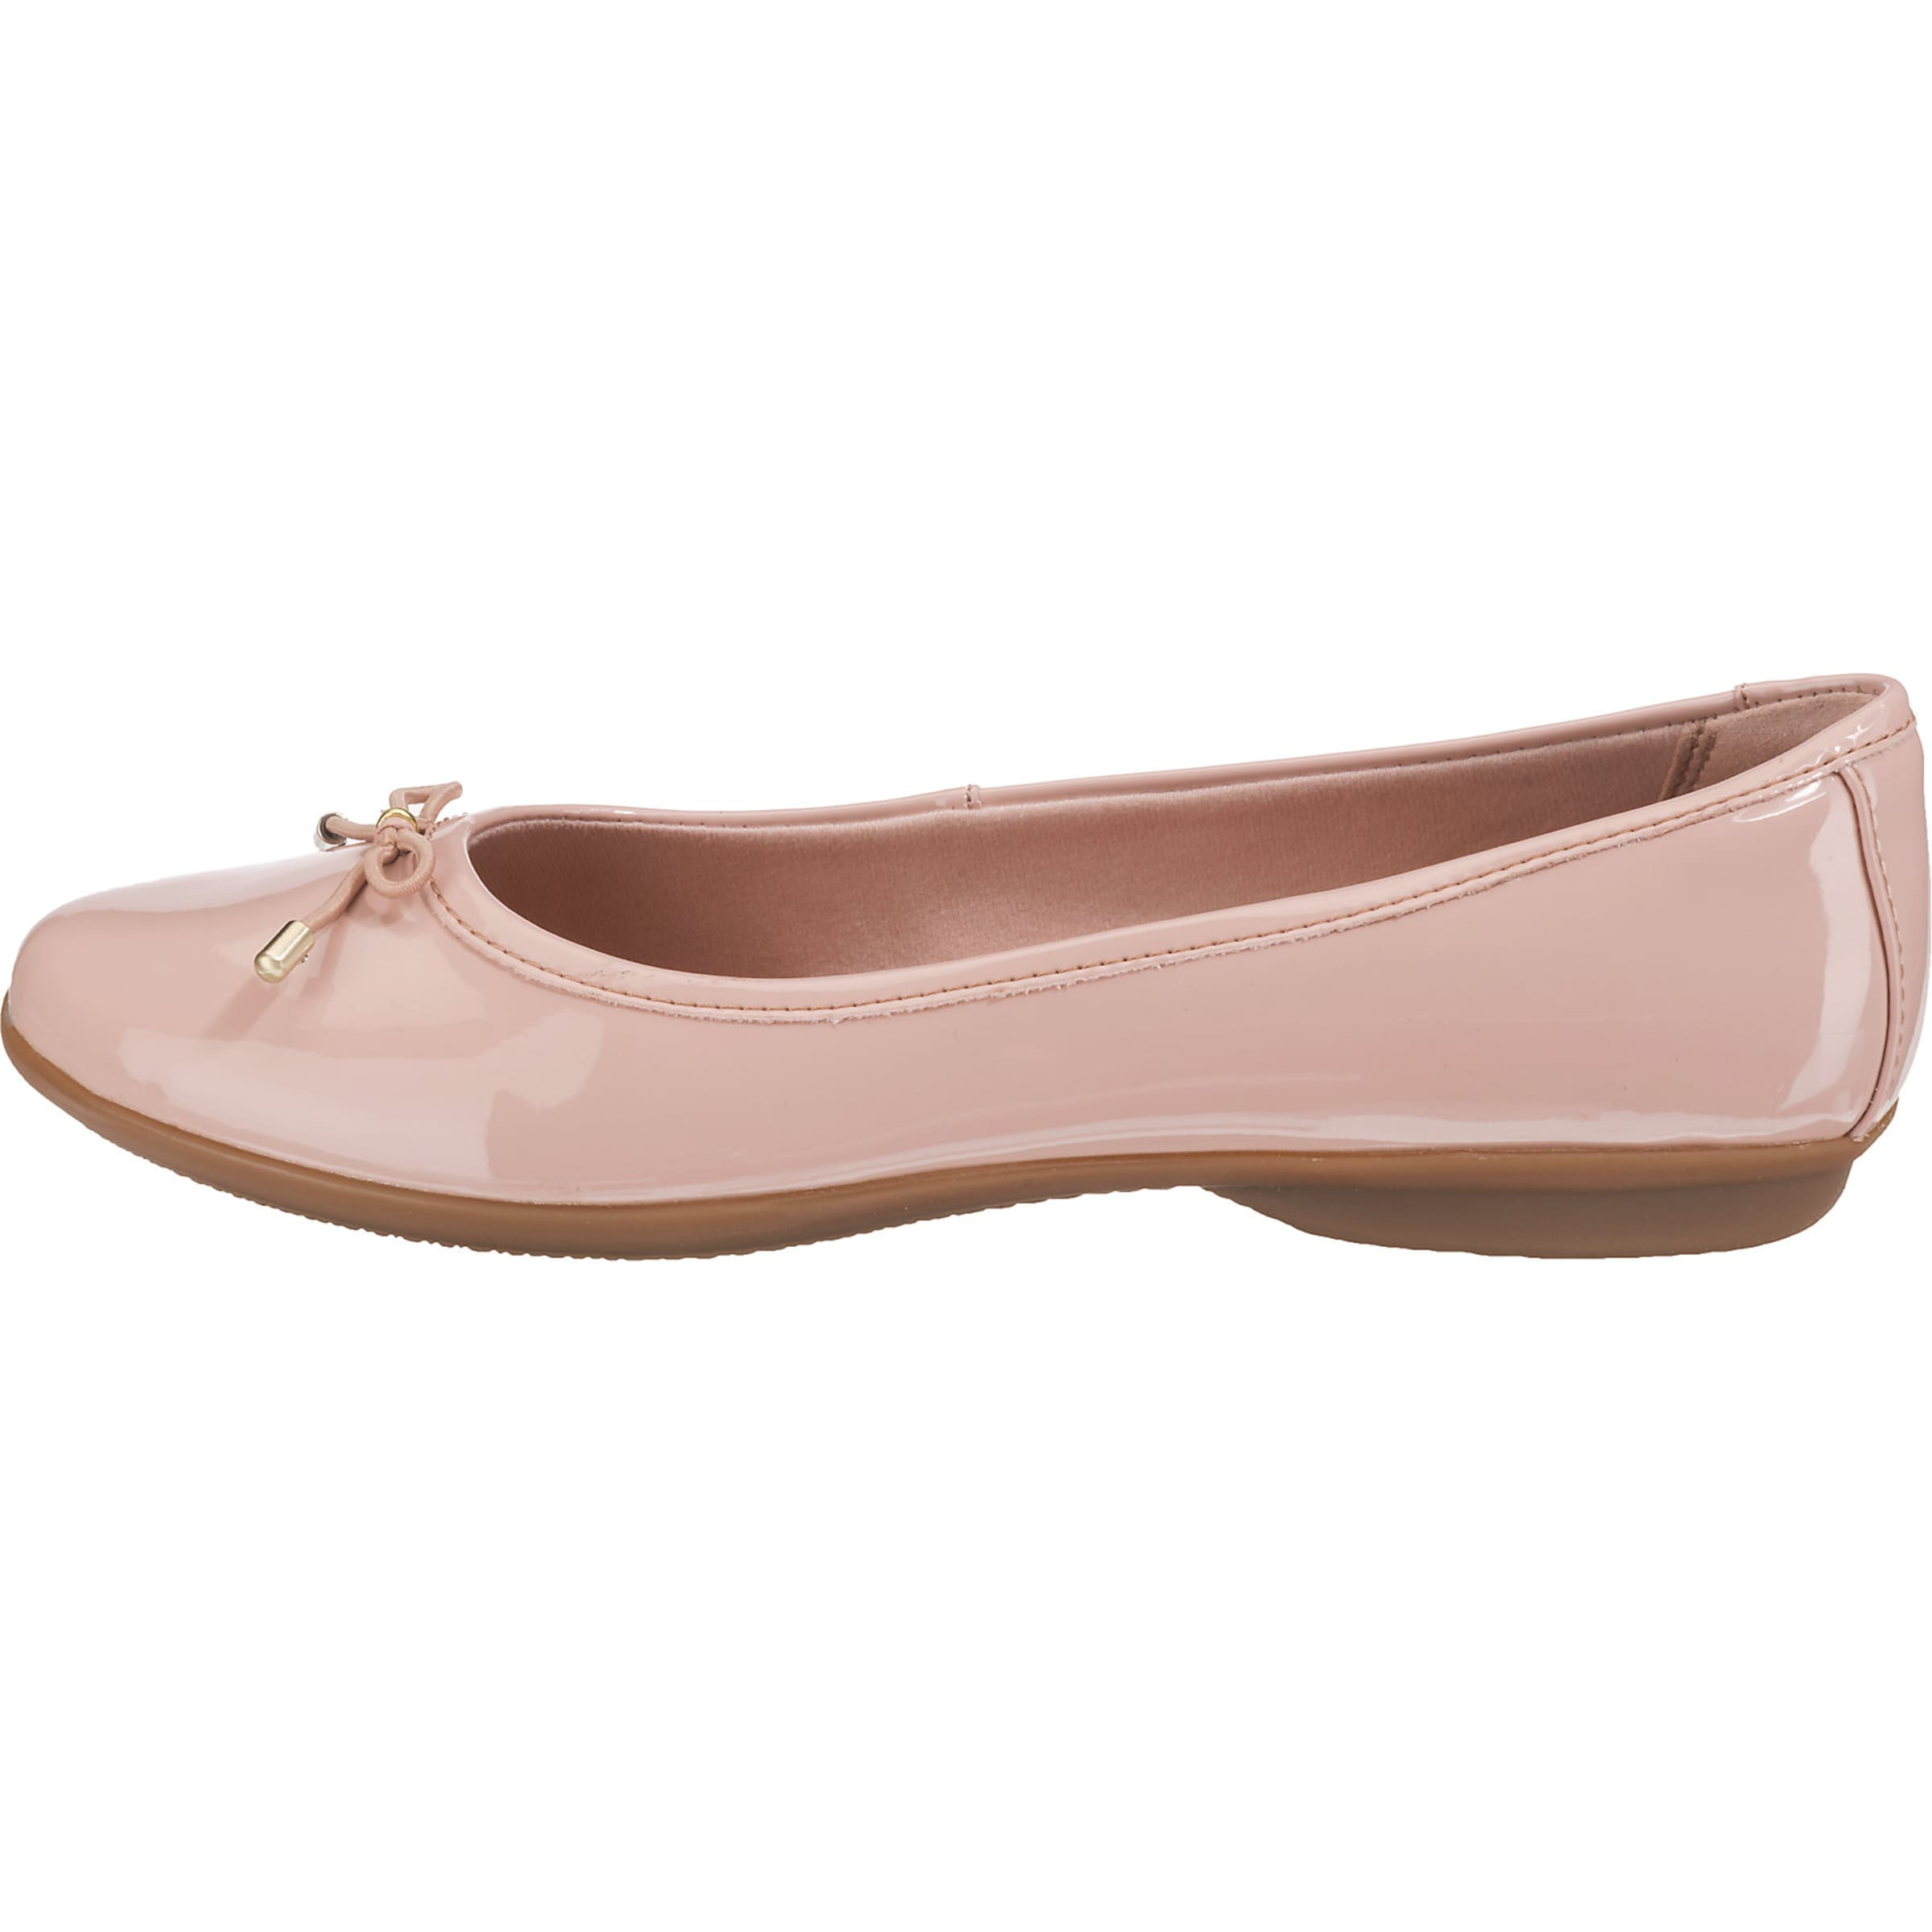 Ballerinas Ballerinas In Clarks Pink Clarks Pink 'gracelinblu' 'gracelinblu' In c4RqA3j5L